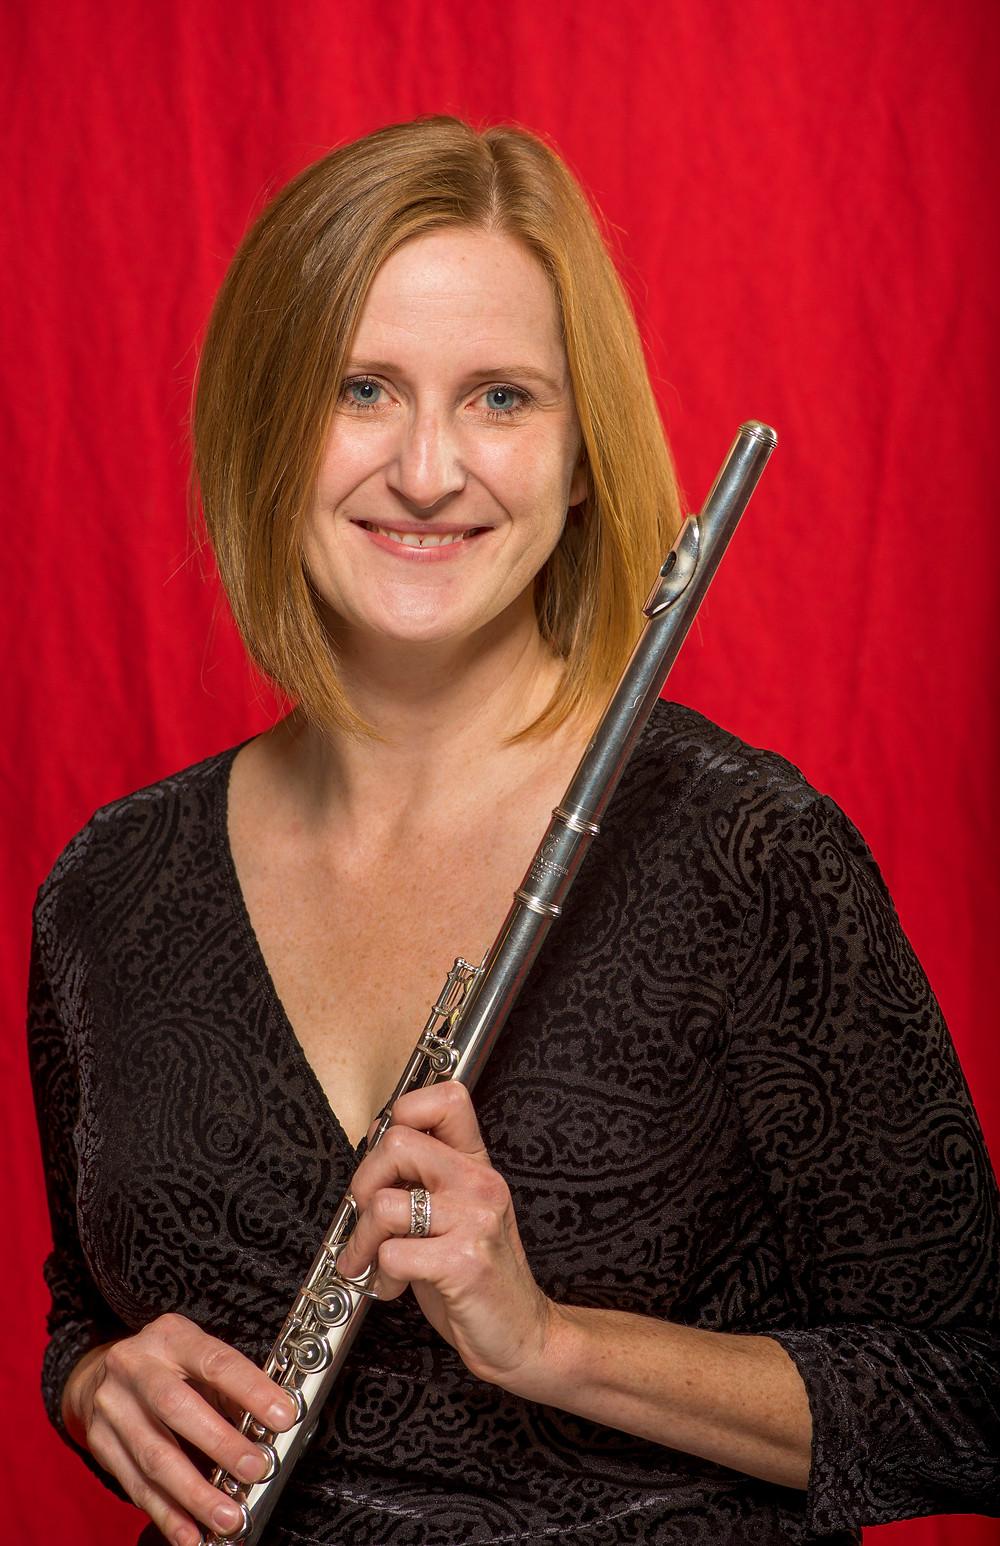 Jennifer Nitchman, Flute